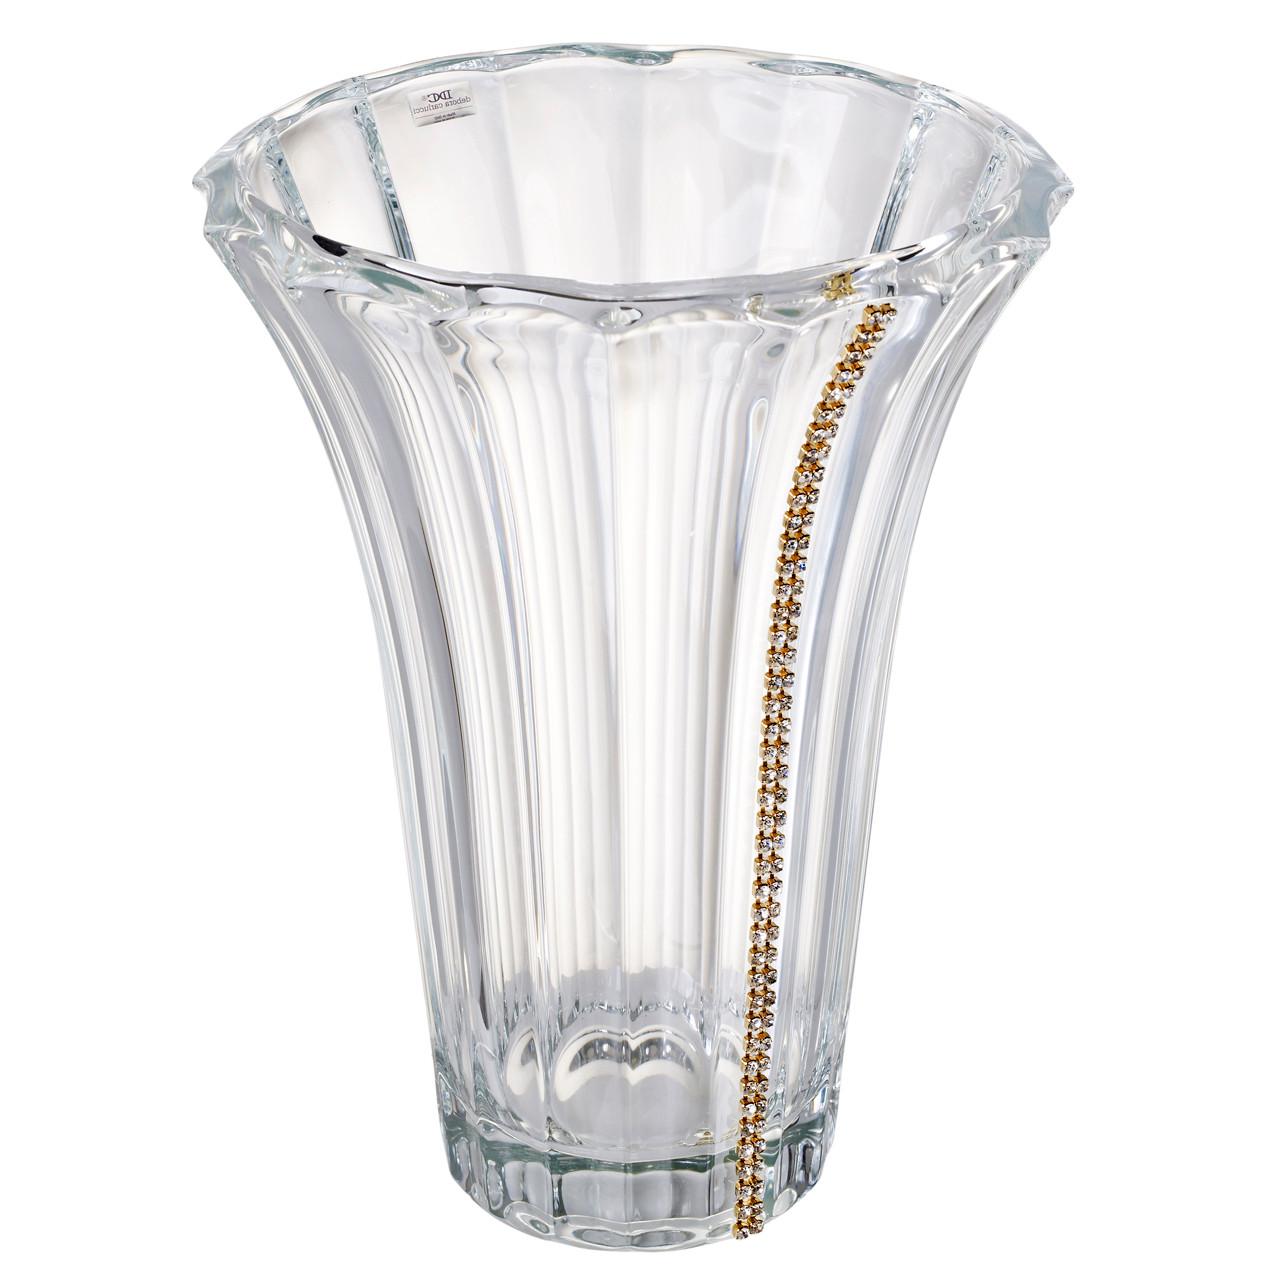 Centerpiece Vase Wedding GIfts I5htavstore